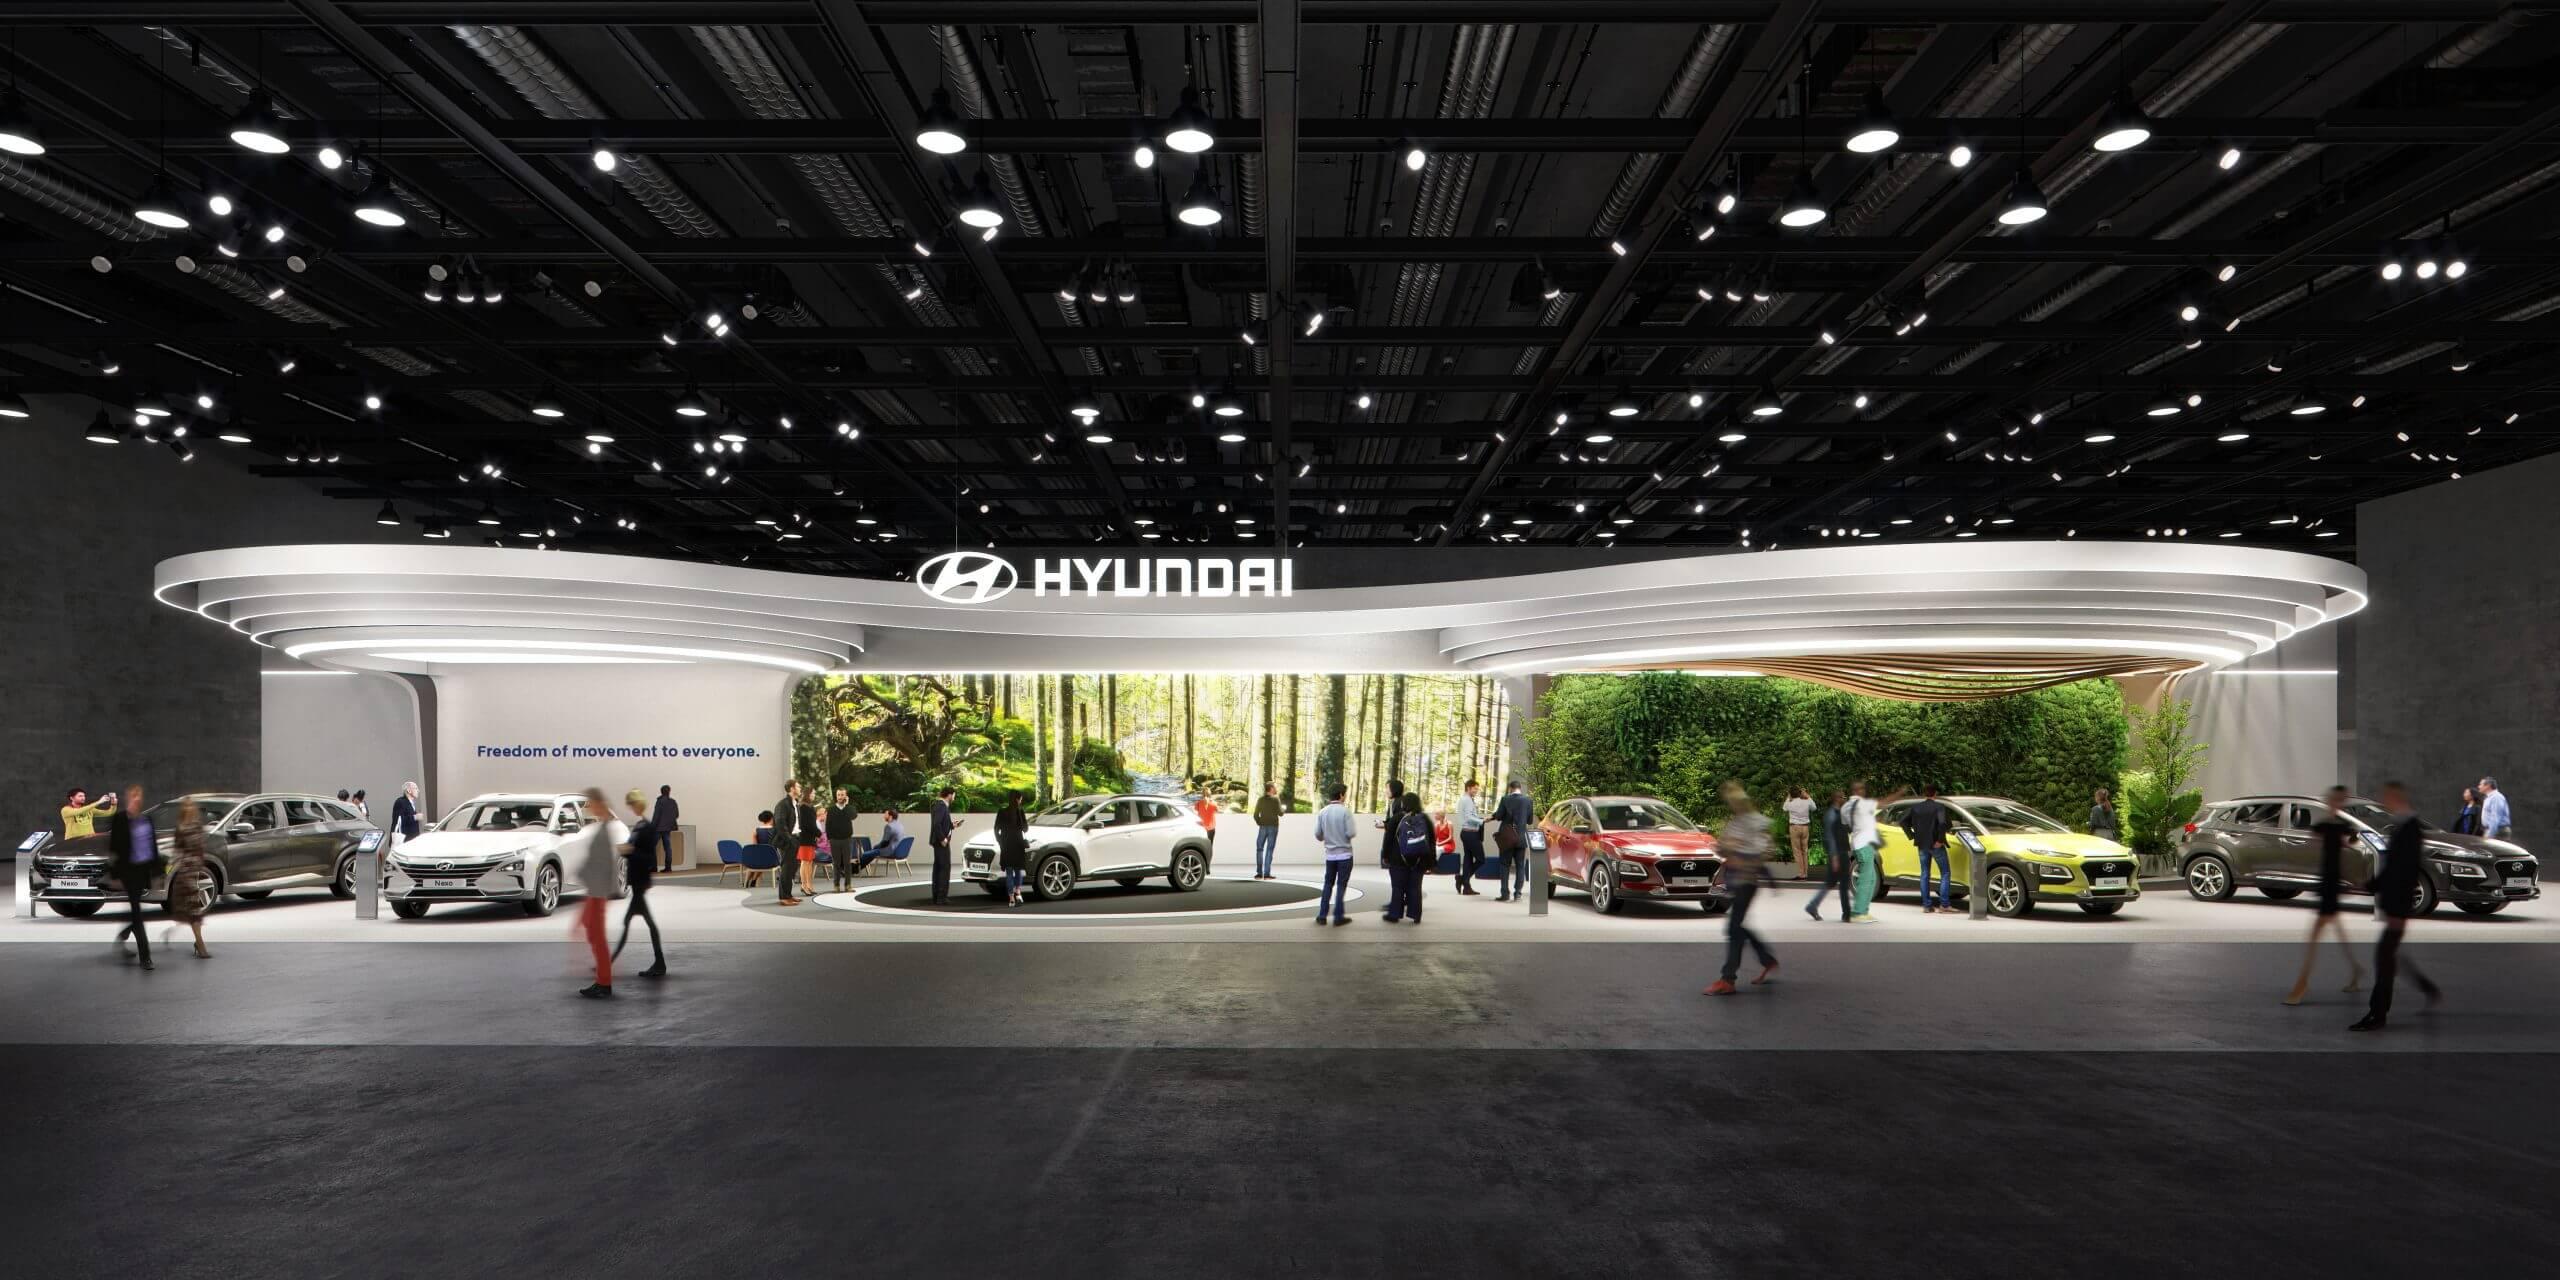 Hyundai_EXHIB_Brandlab_TheForest